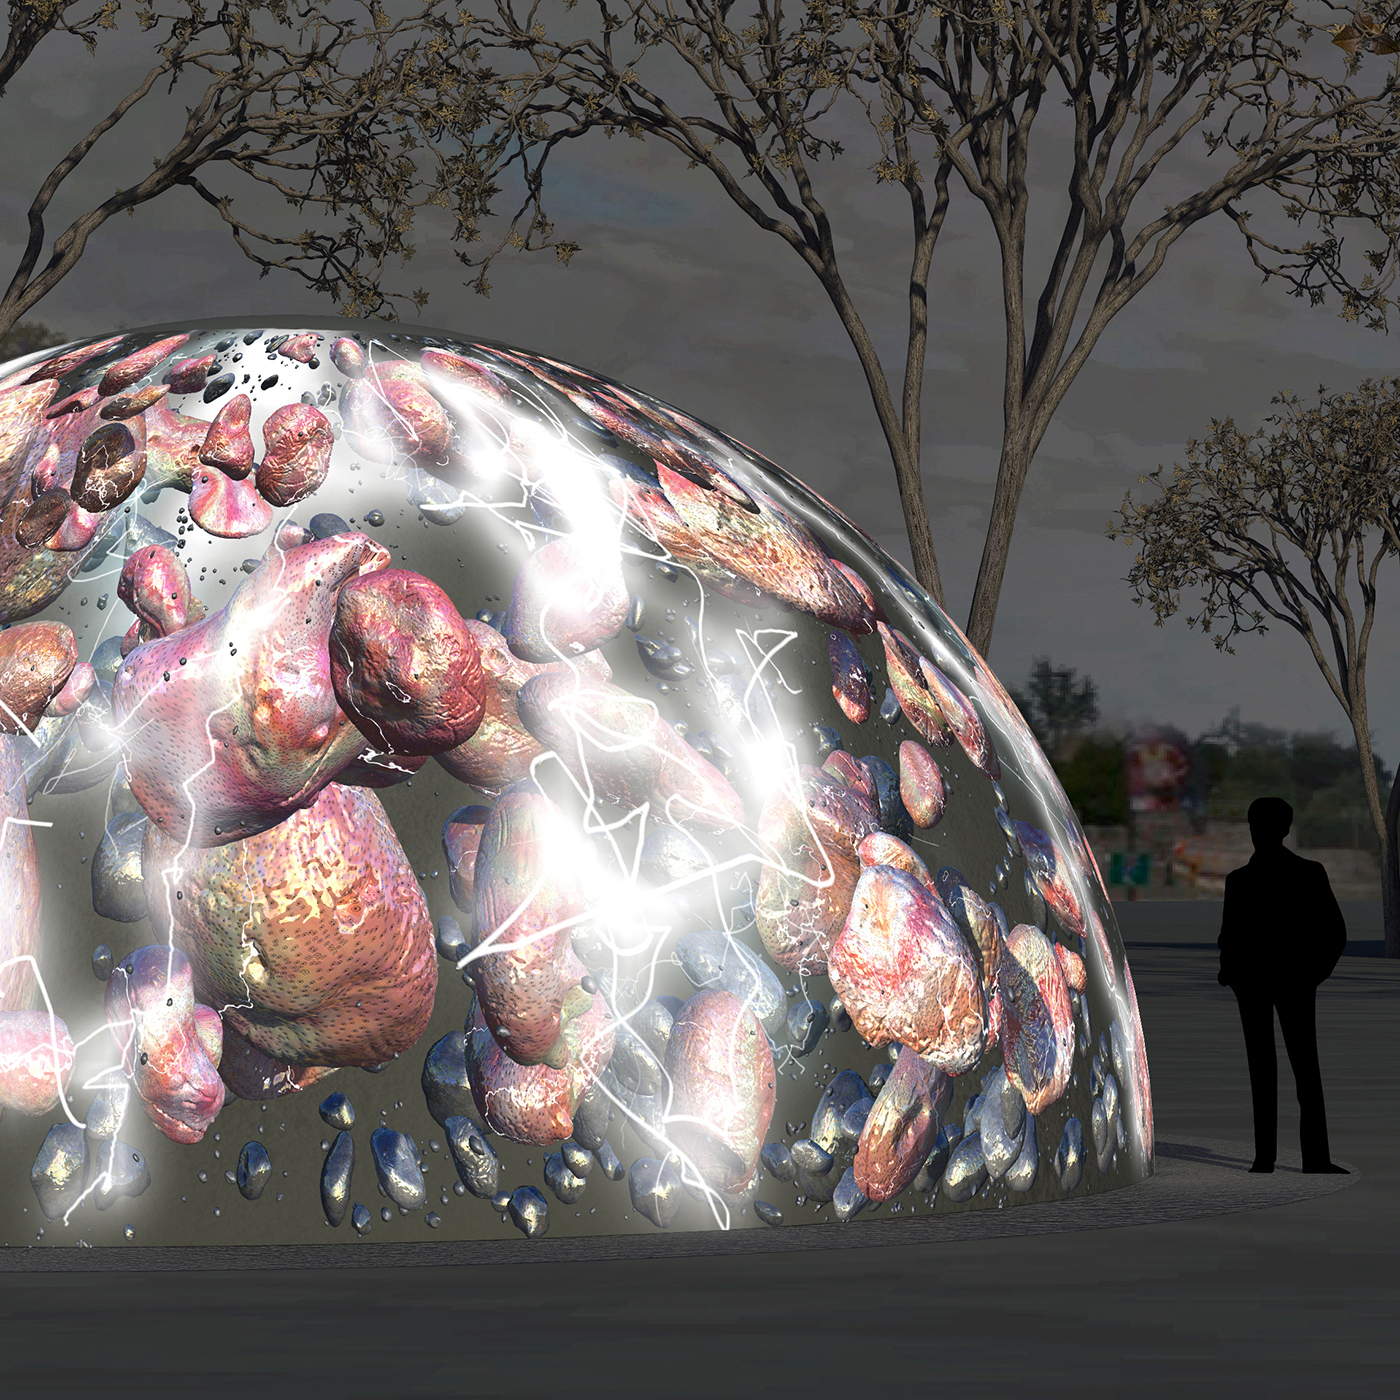 winter fountains association for public art